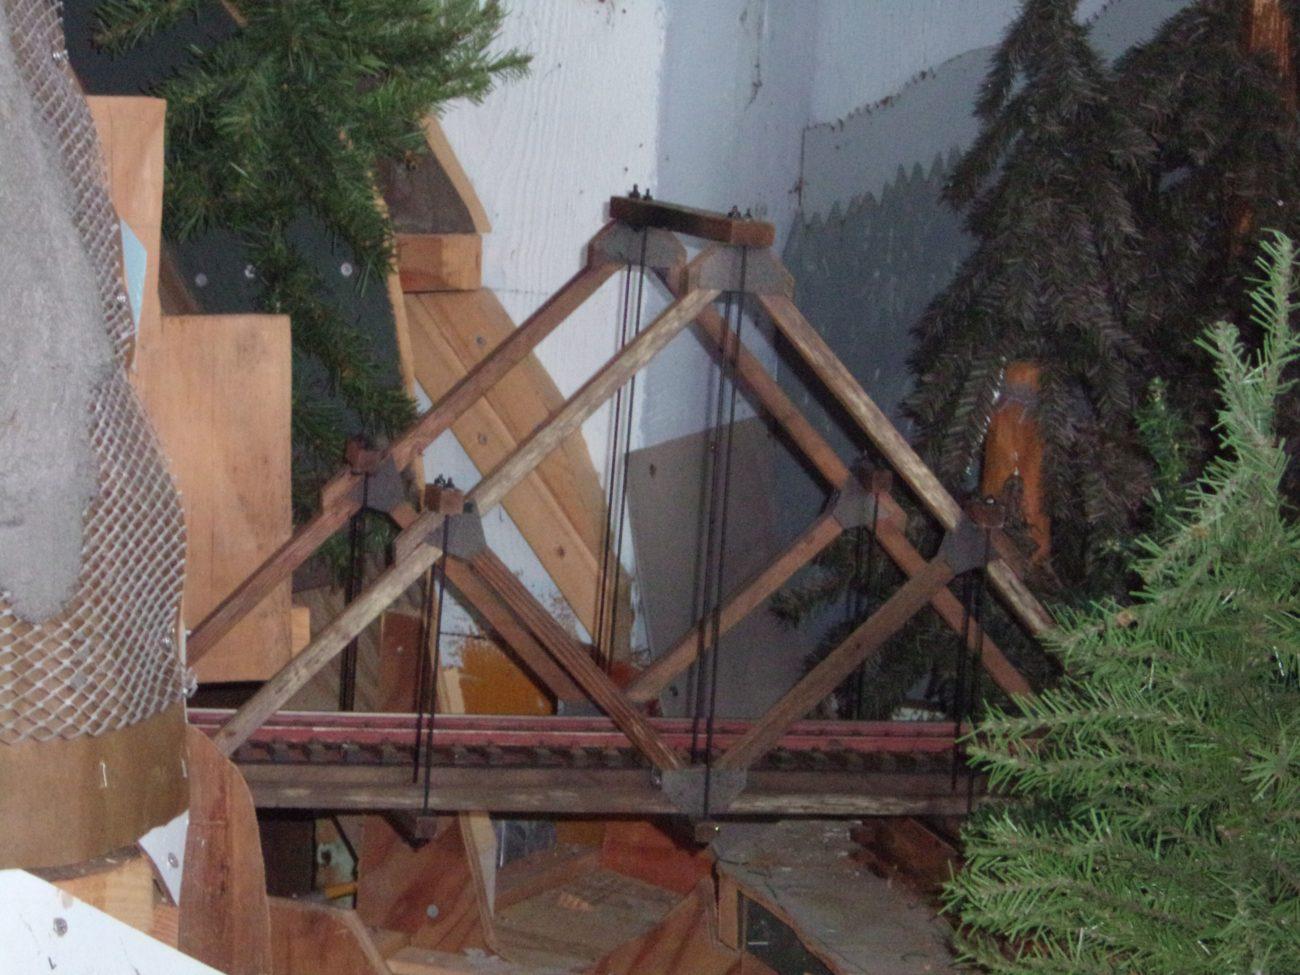 Close up of Santa Cruz Frank's Model of an A-Frame Bridge